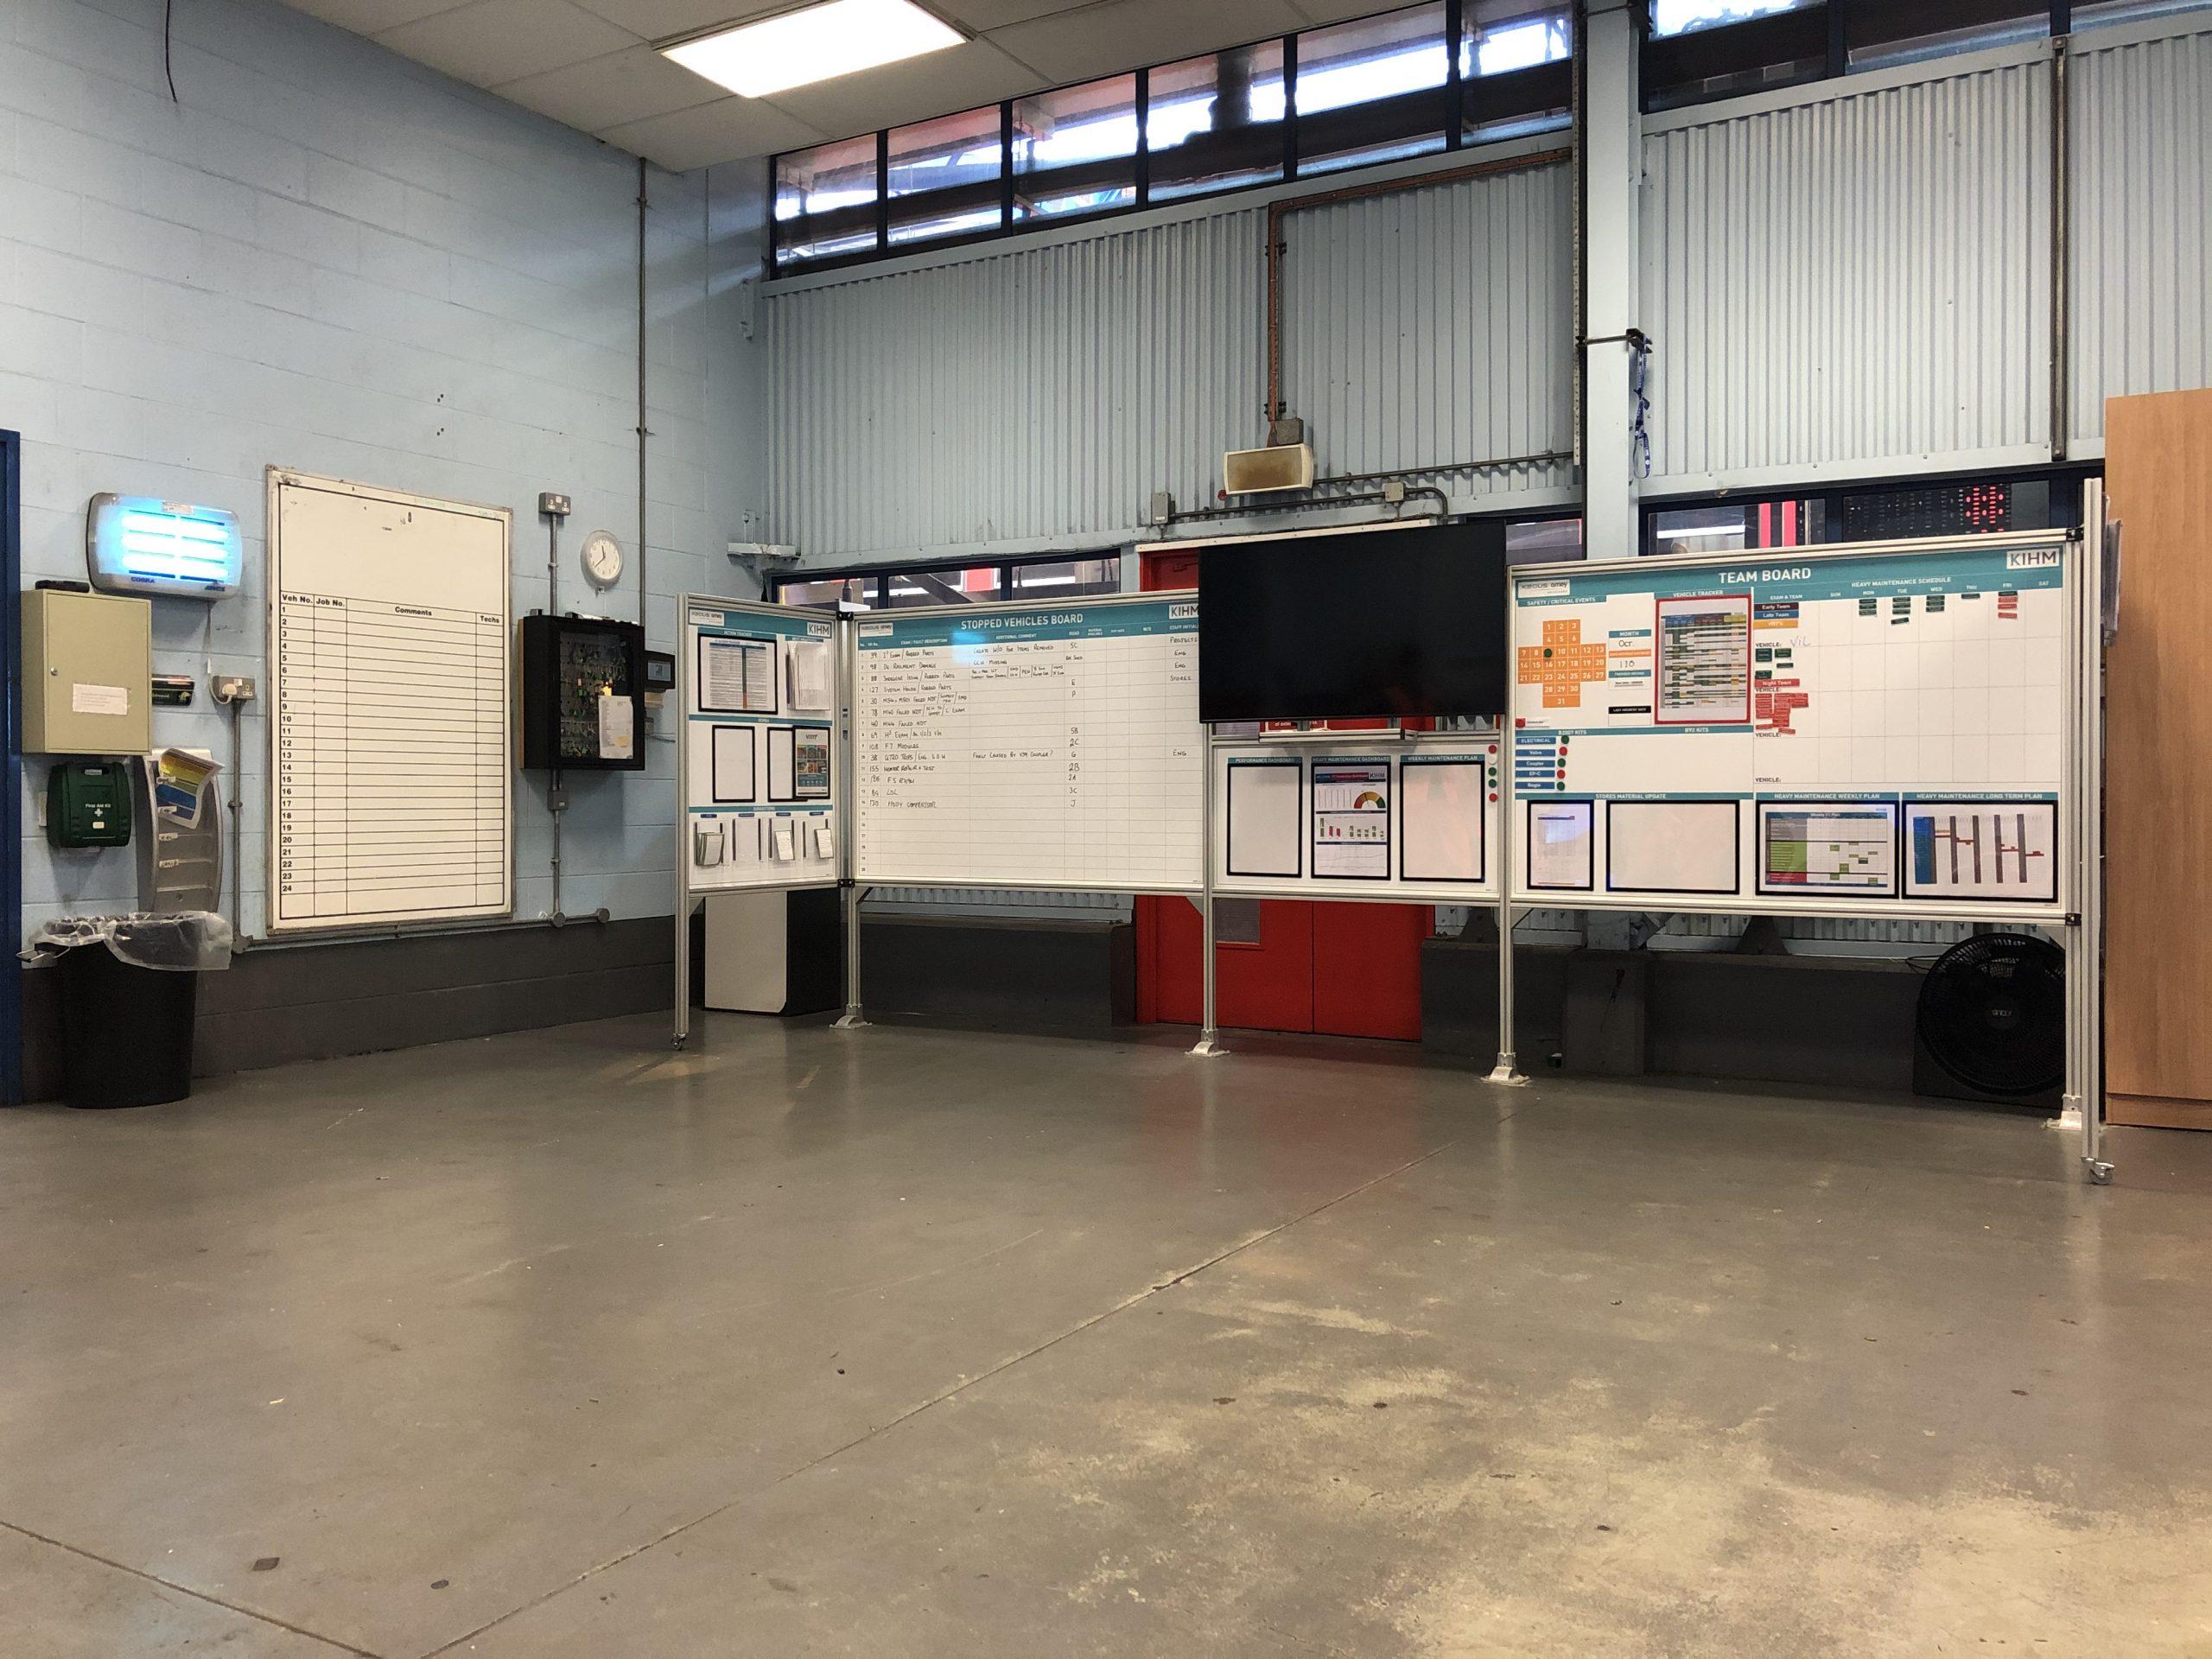 Keolis Amey DLR - Management Centre - Whiteboard (1)